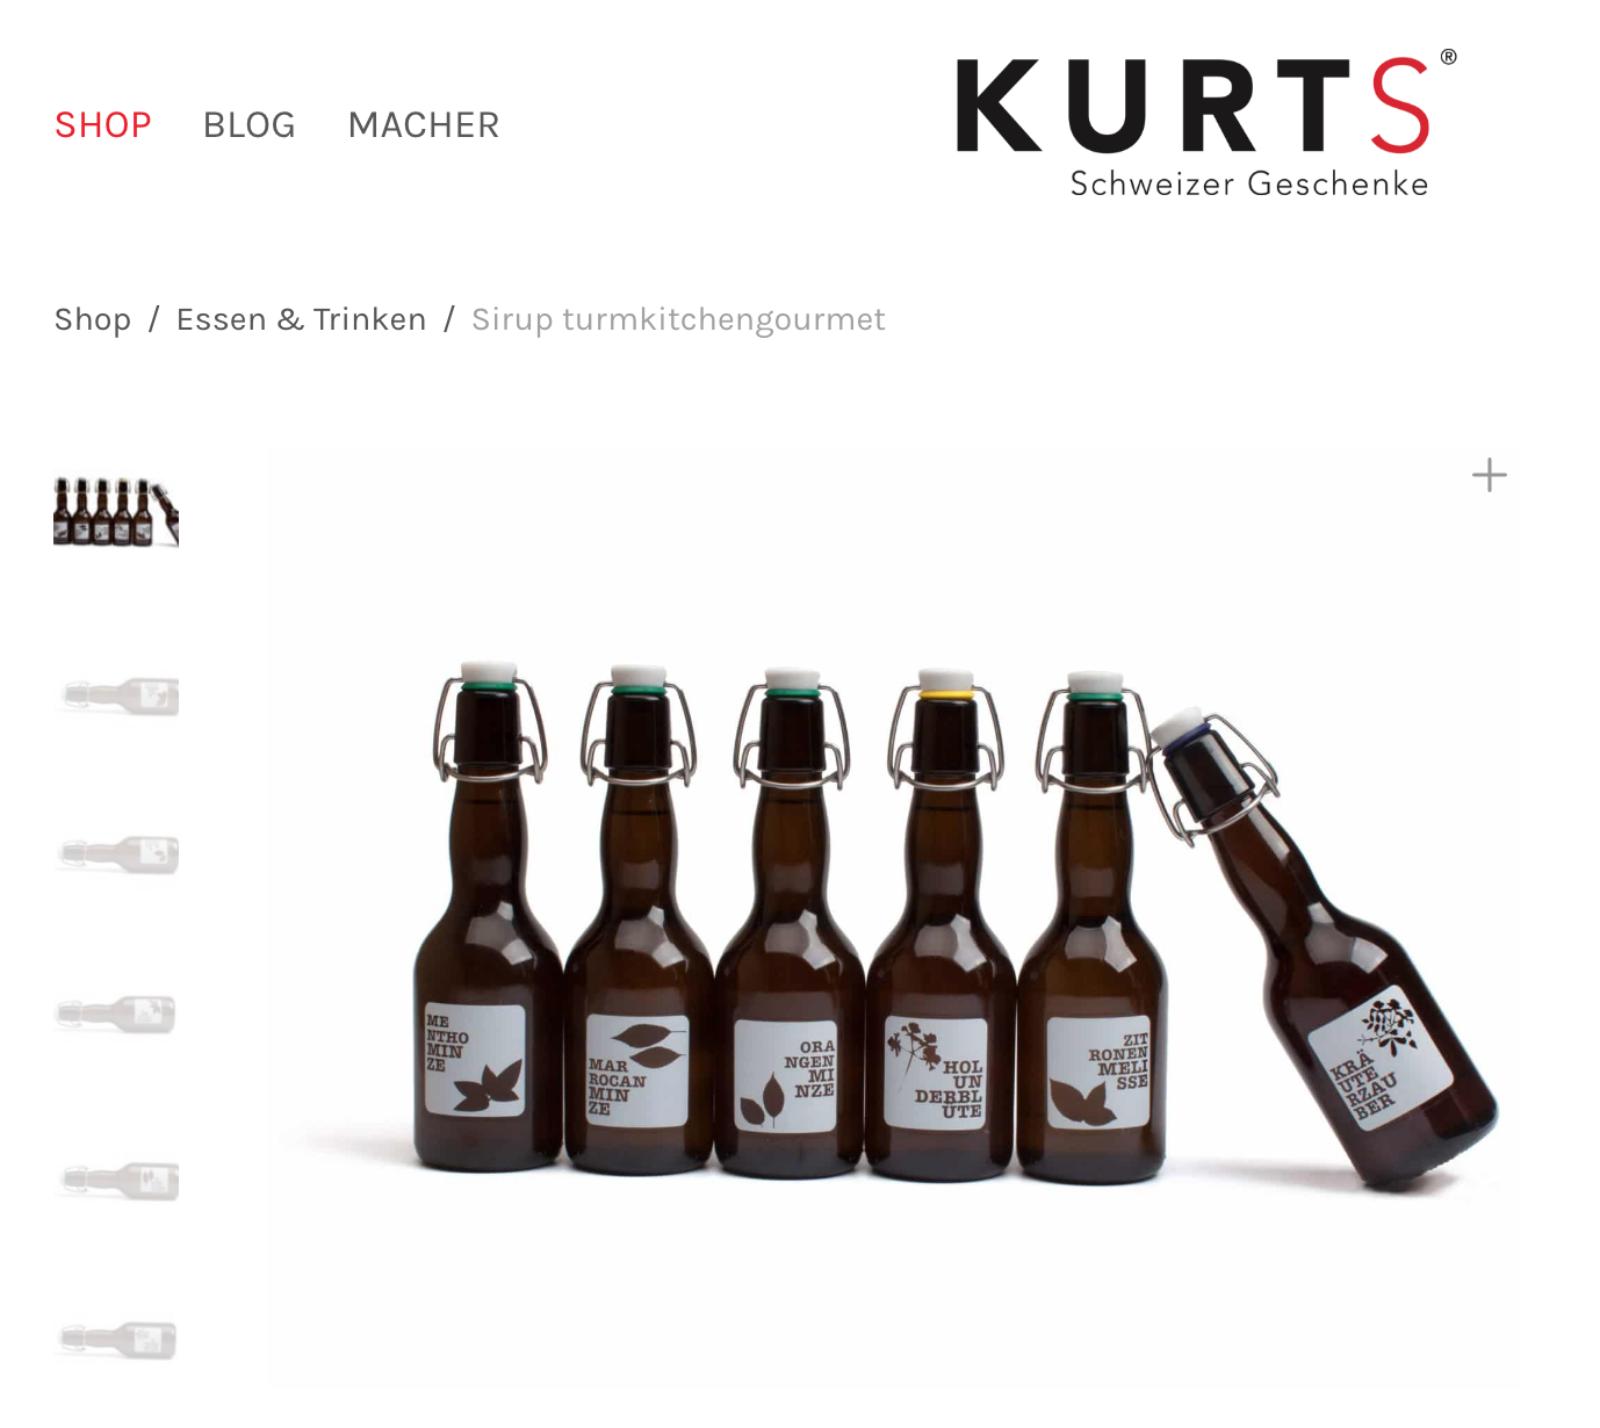 Onlineshop Kurts.ch